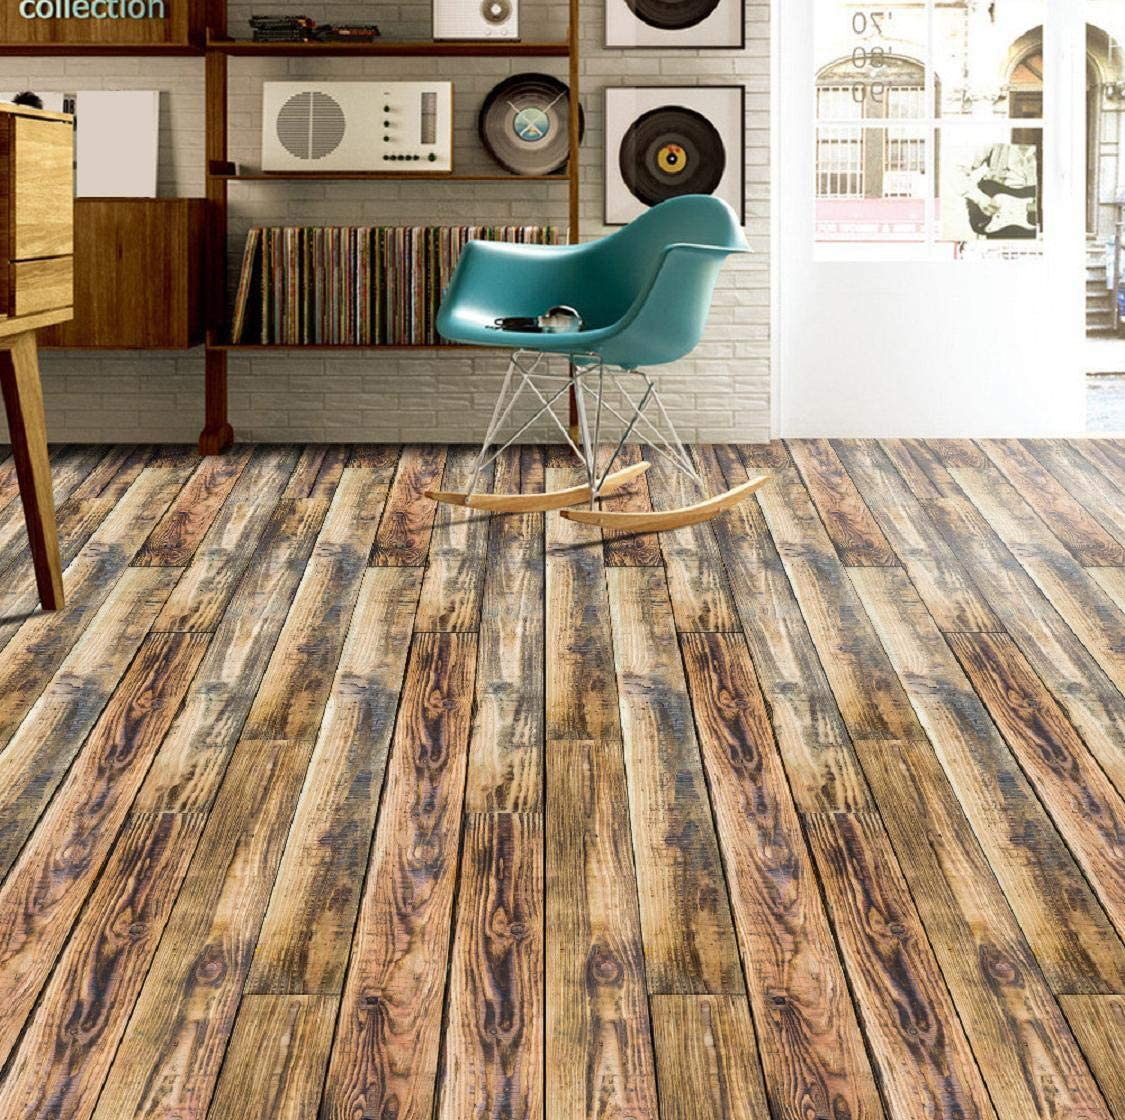 Boddenly Adhesive Tile Art Floor Wall Decal Sticker Diy Kitchen